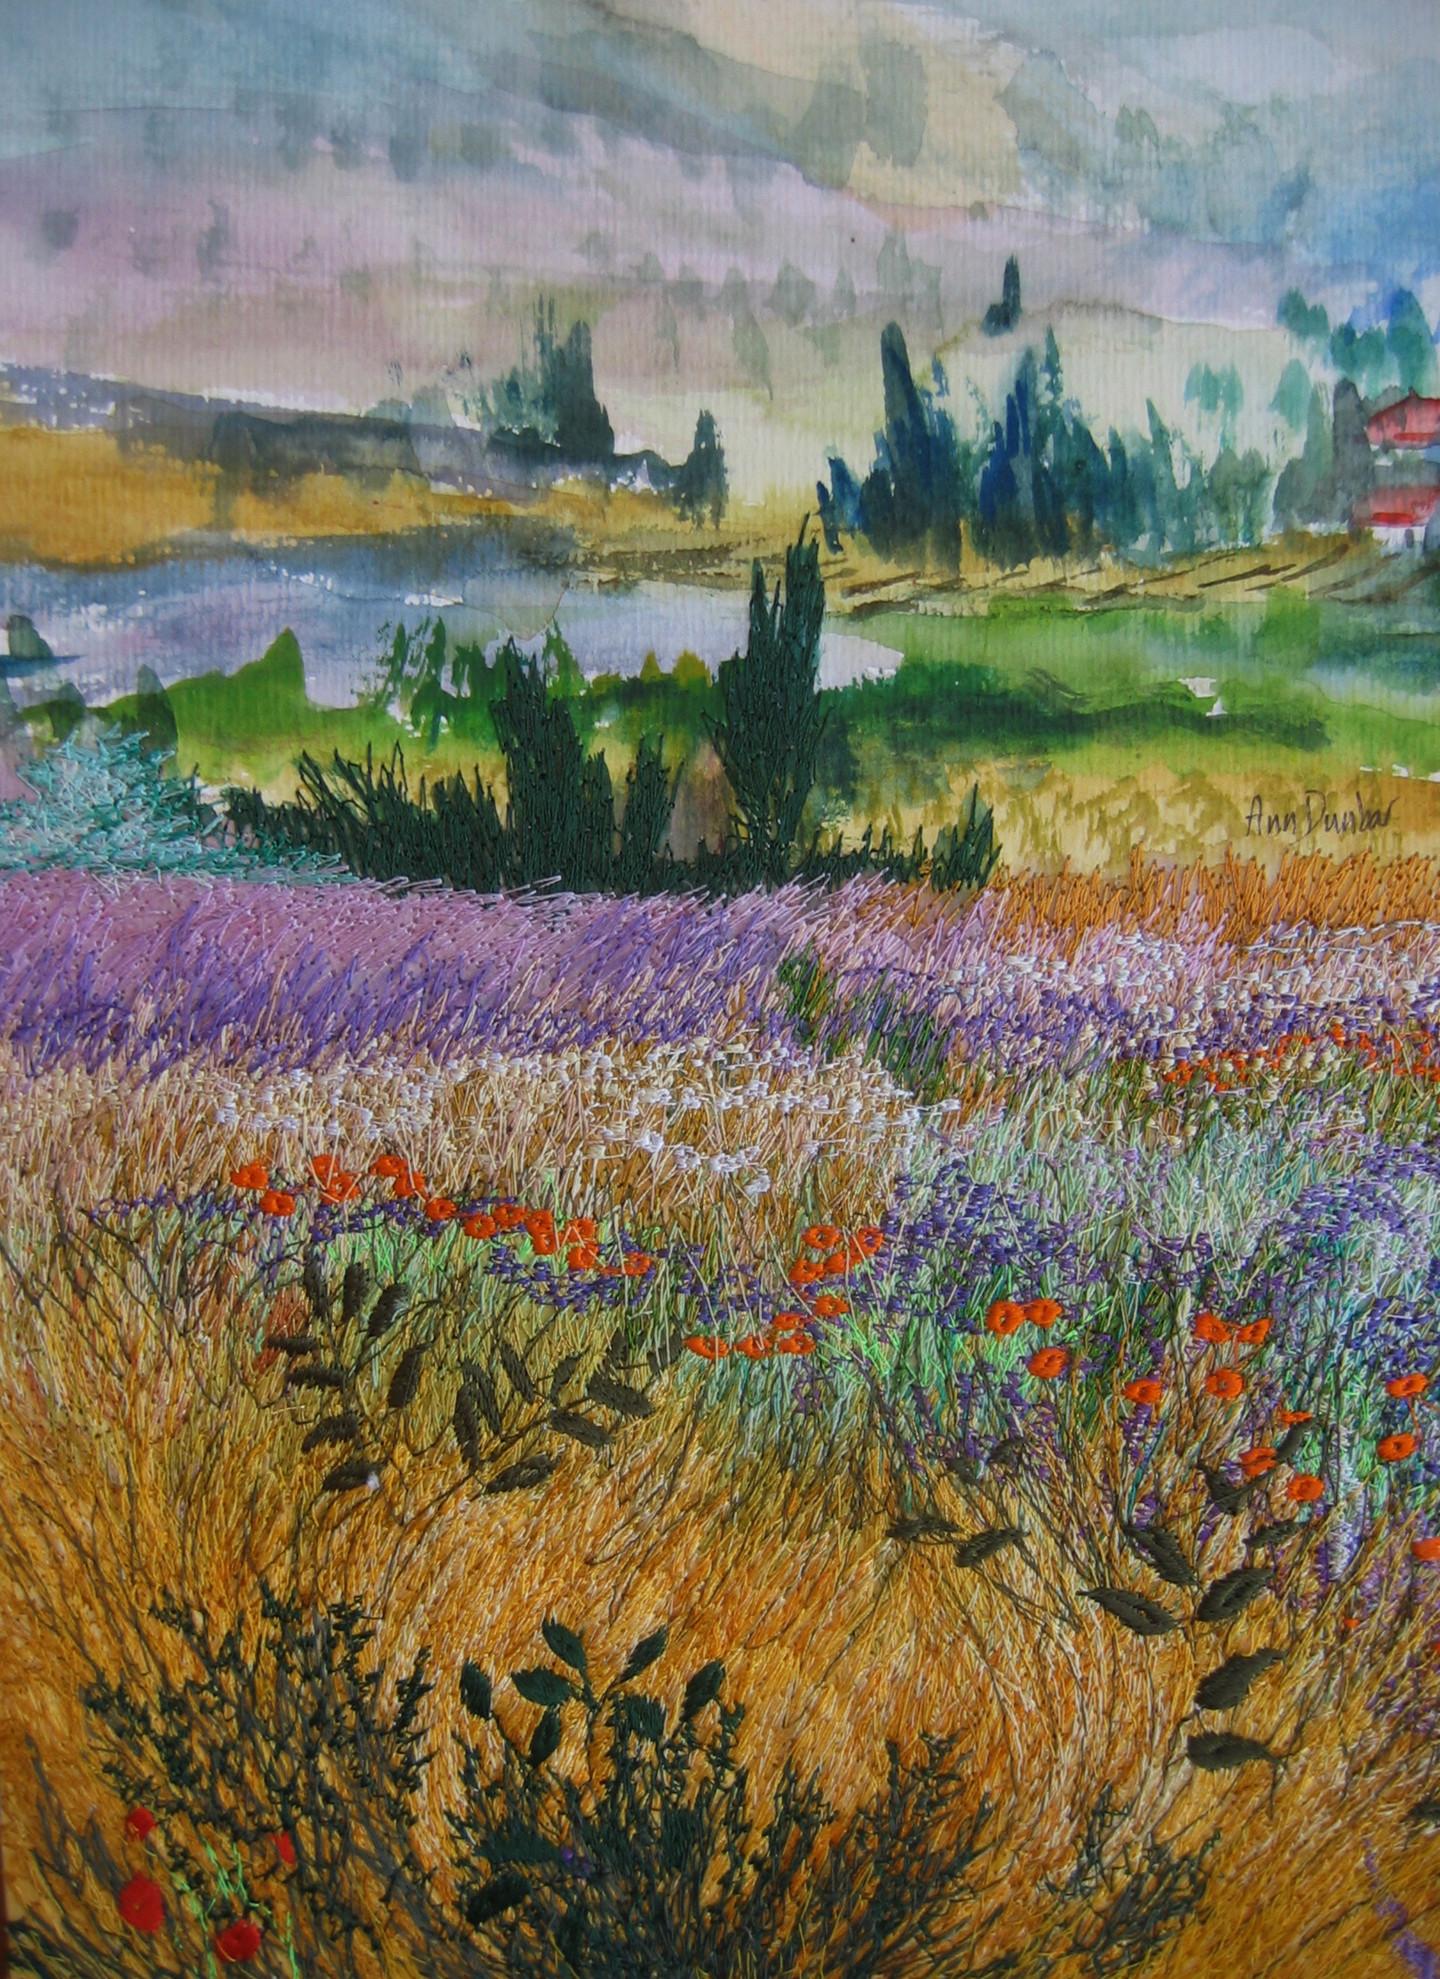 Ann Dunbar - Summer colours of Provençal landscape. 1